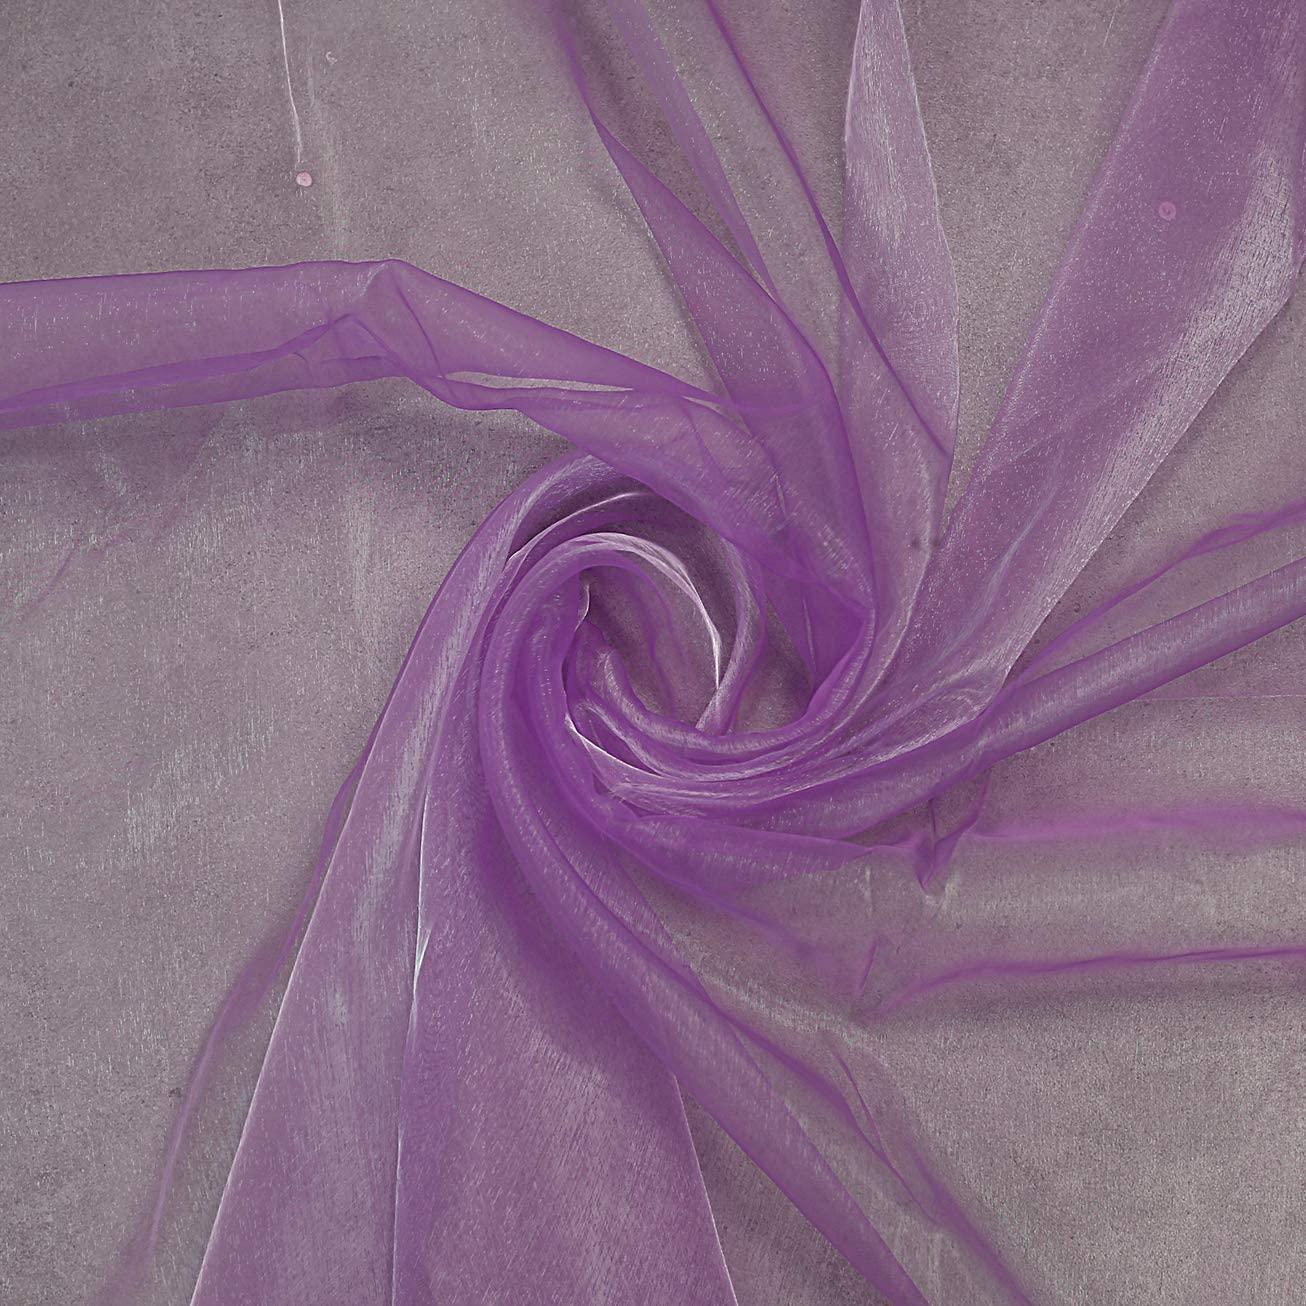 "mds Pack of 10 Yard Bridal Solid Sheer Organza Fabric Bolt for Wedding Dress,Fashion, Crafts, Decorations Silky Shiny Organza 44""- Light Purple"